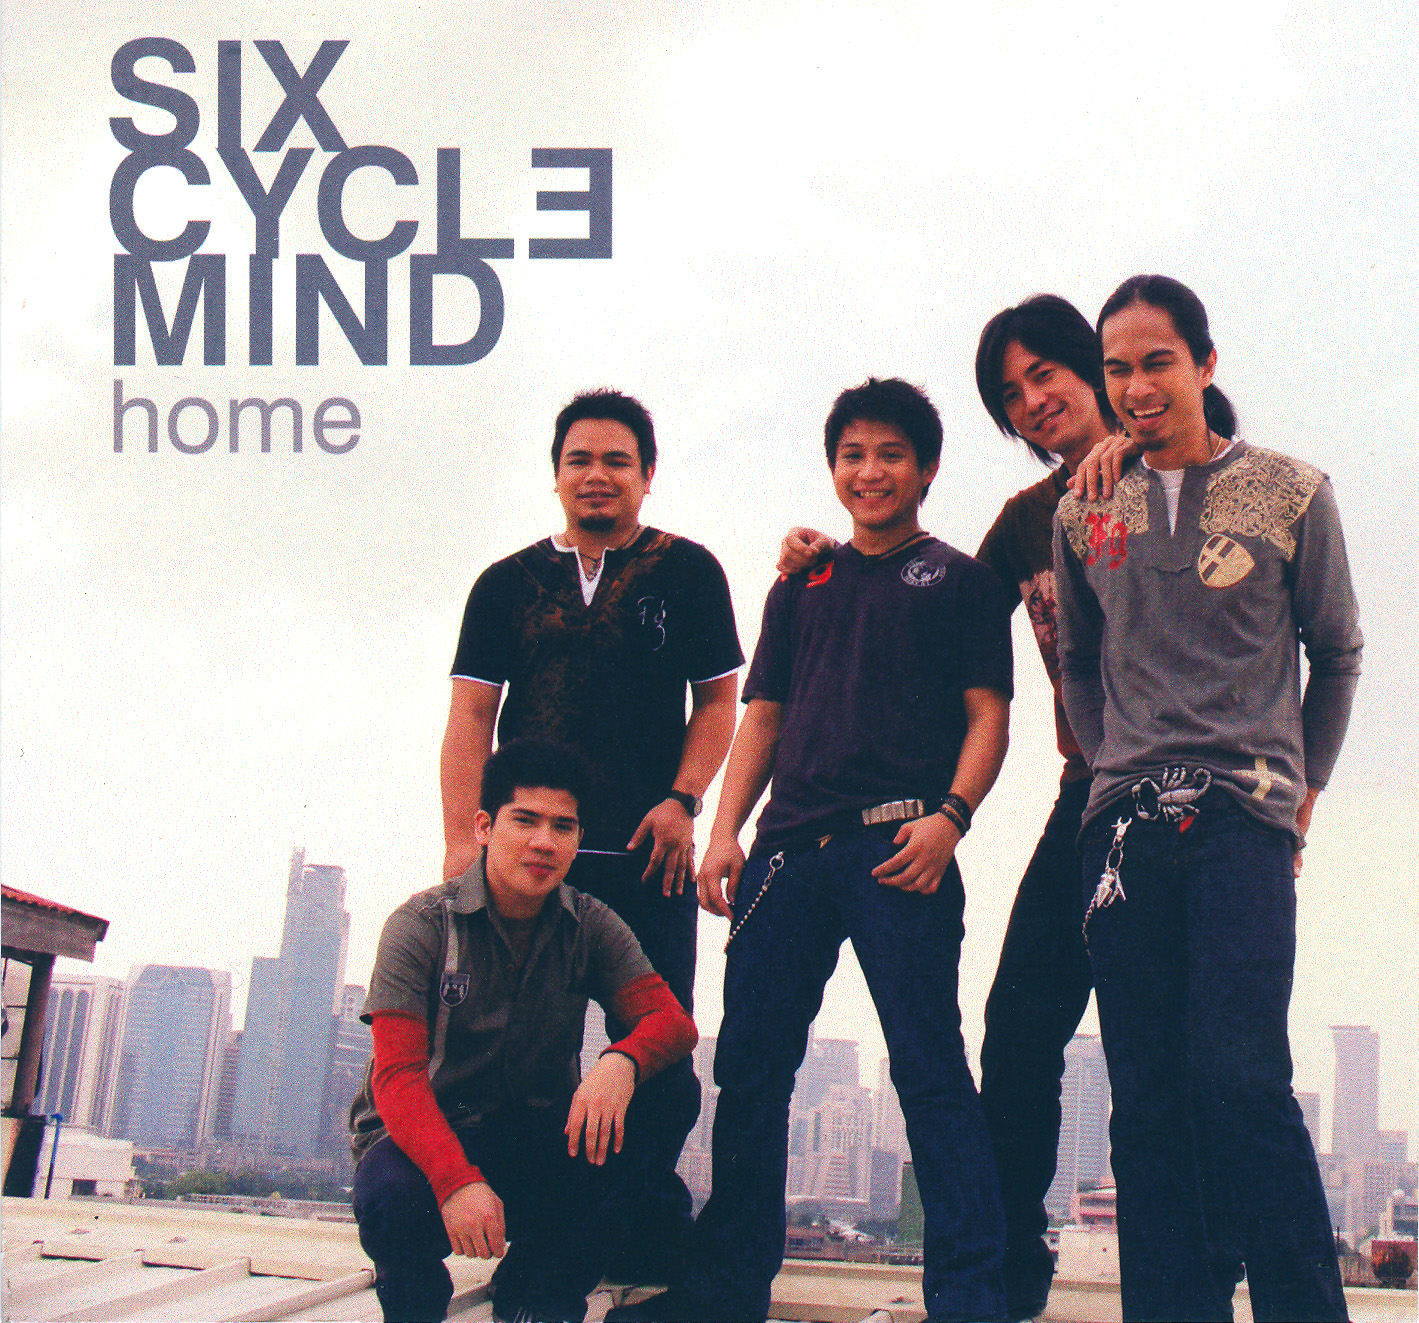 6 cycle mind - magsasaya lyrics | azlyrics.biz